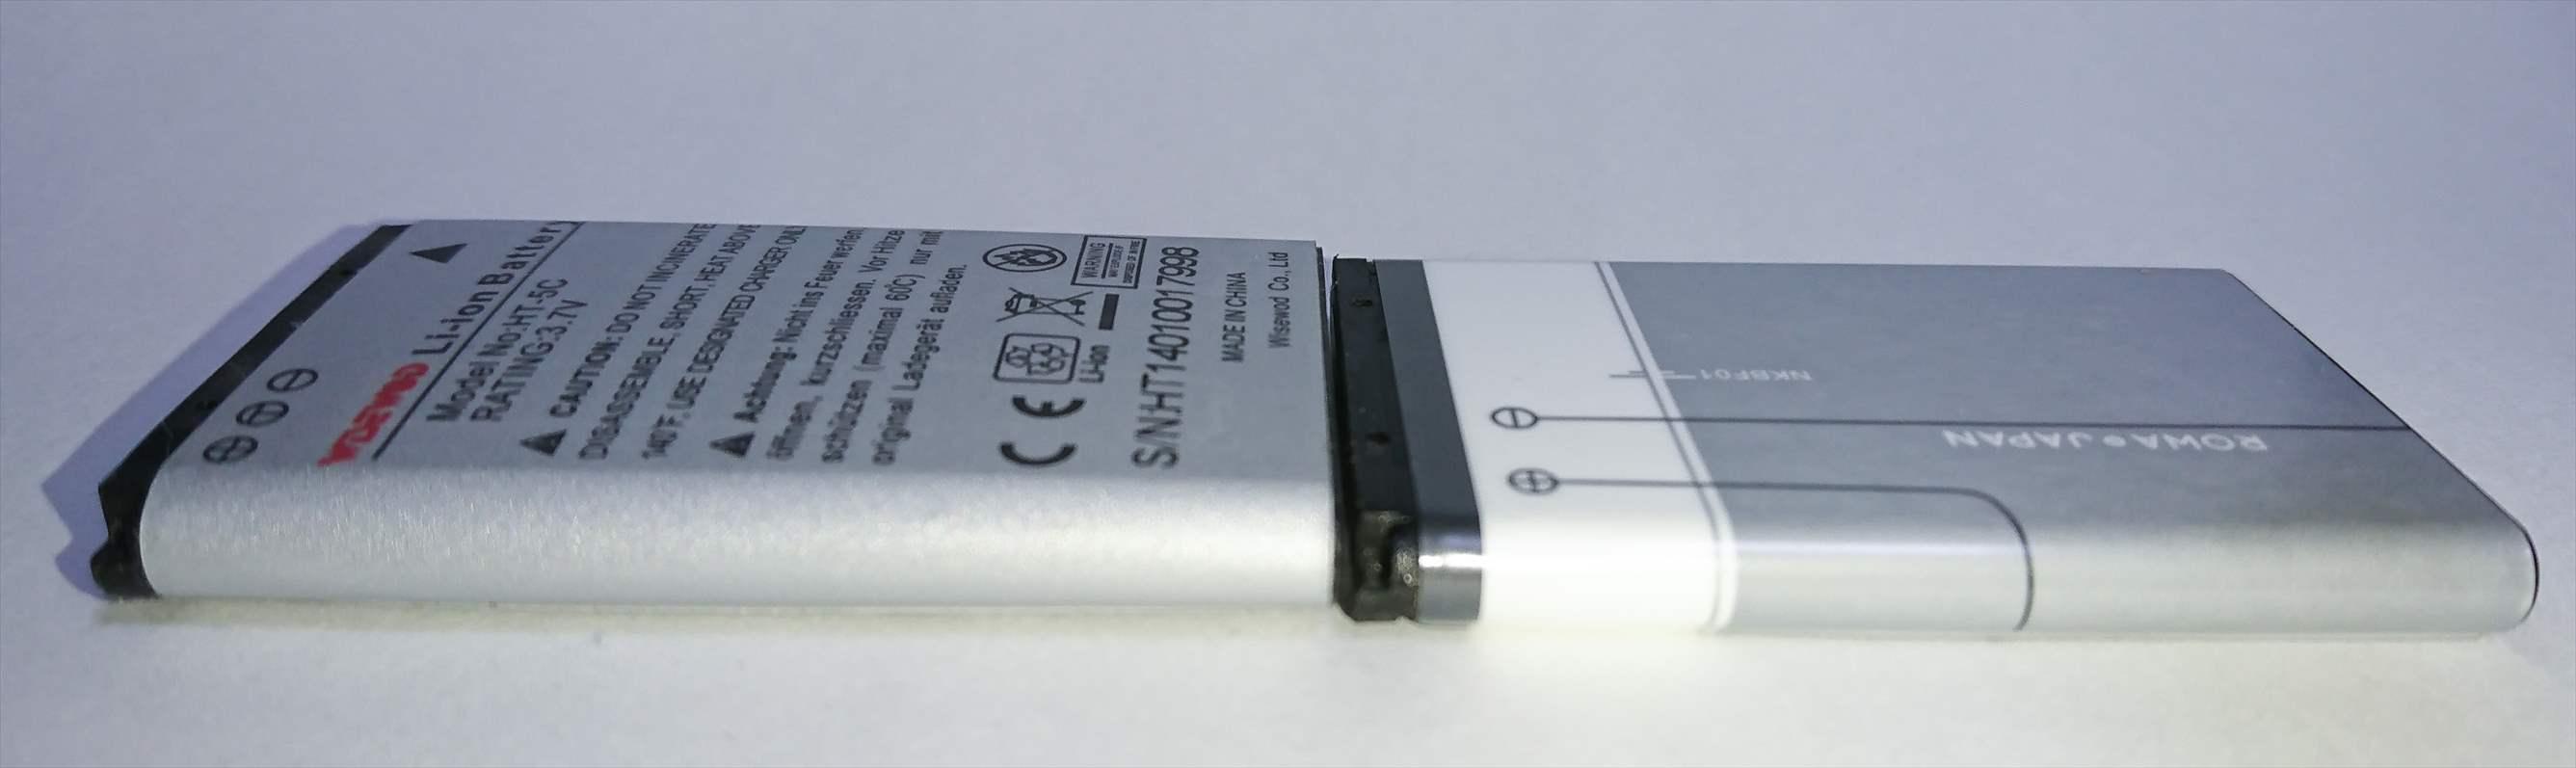 LAP+ 747Pro バッテリー交換